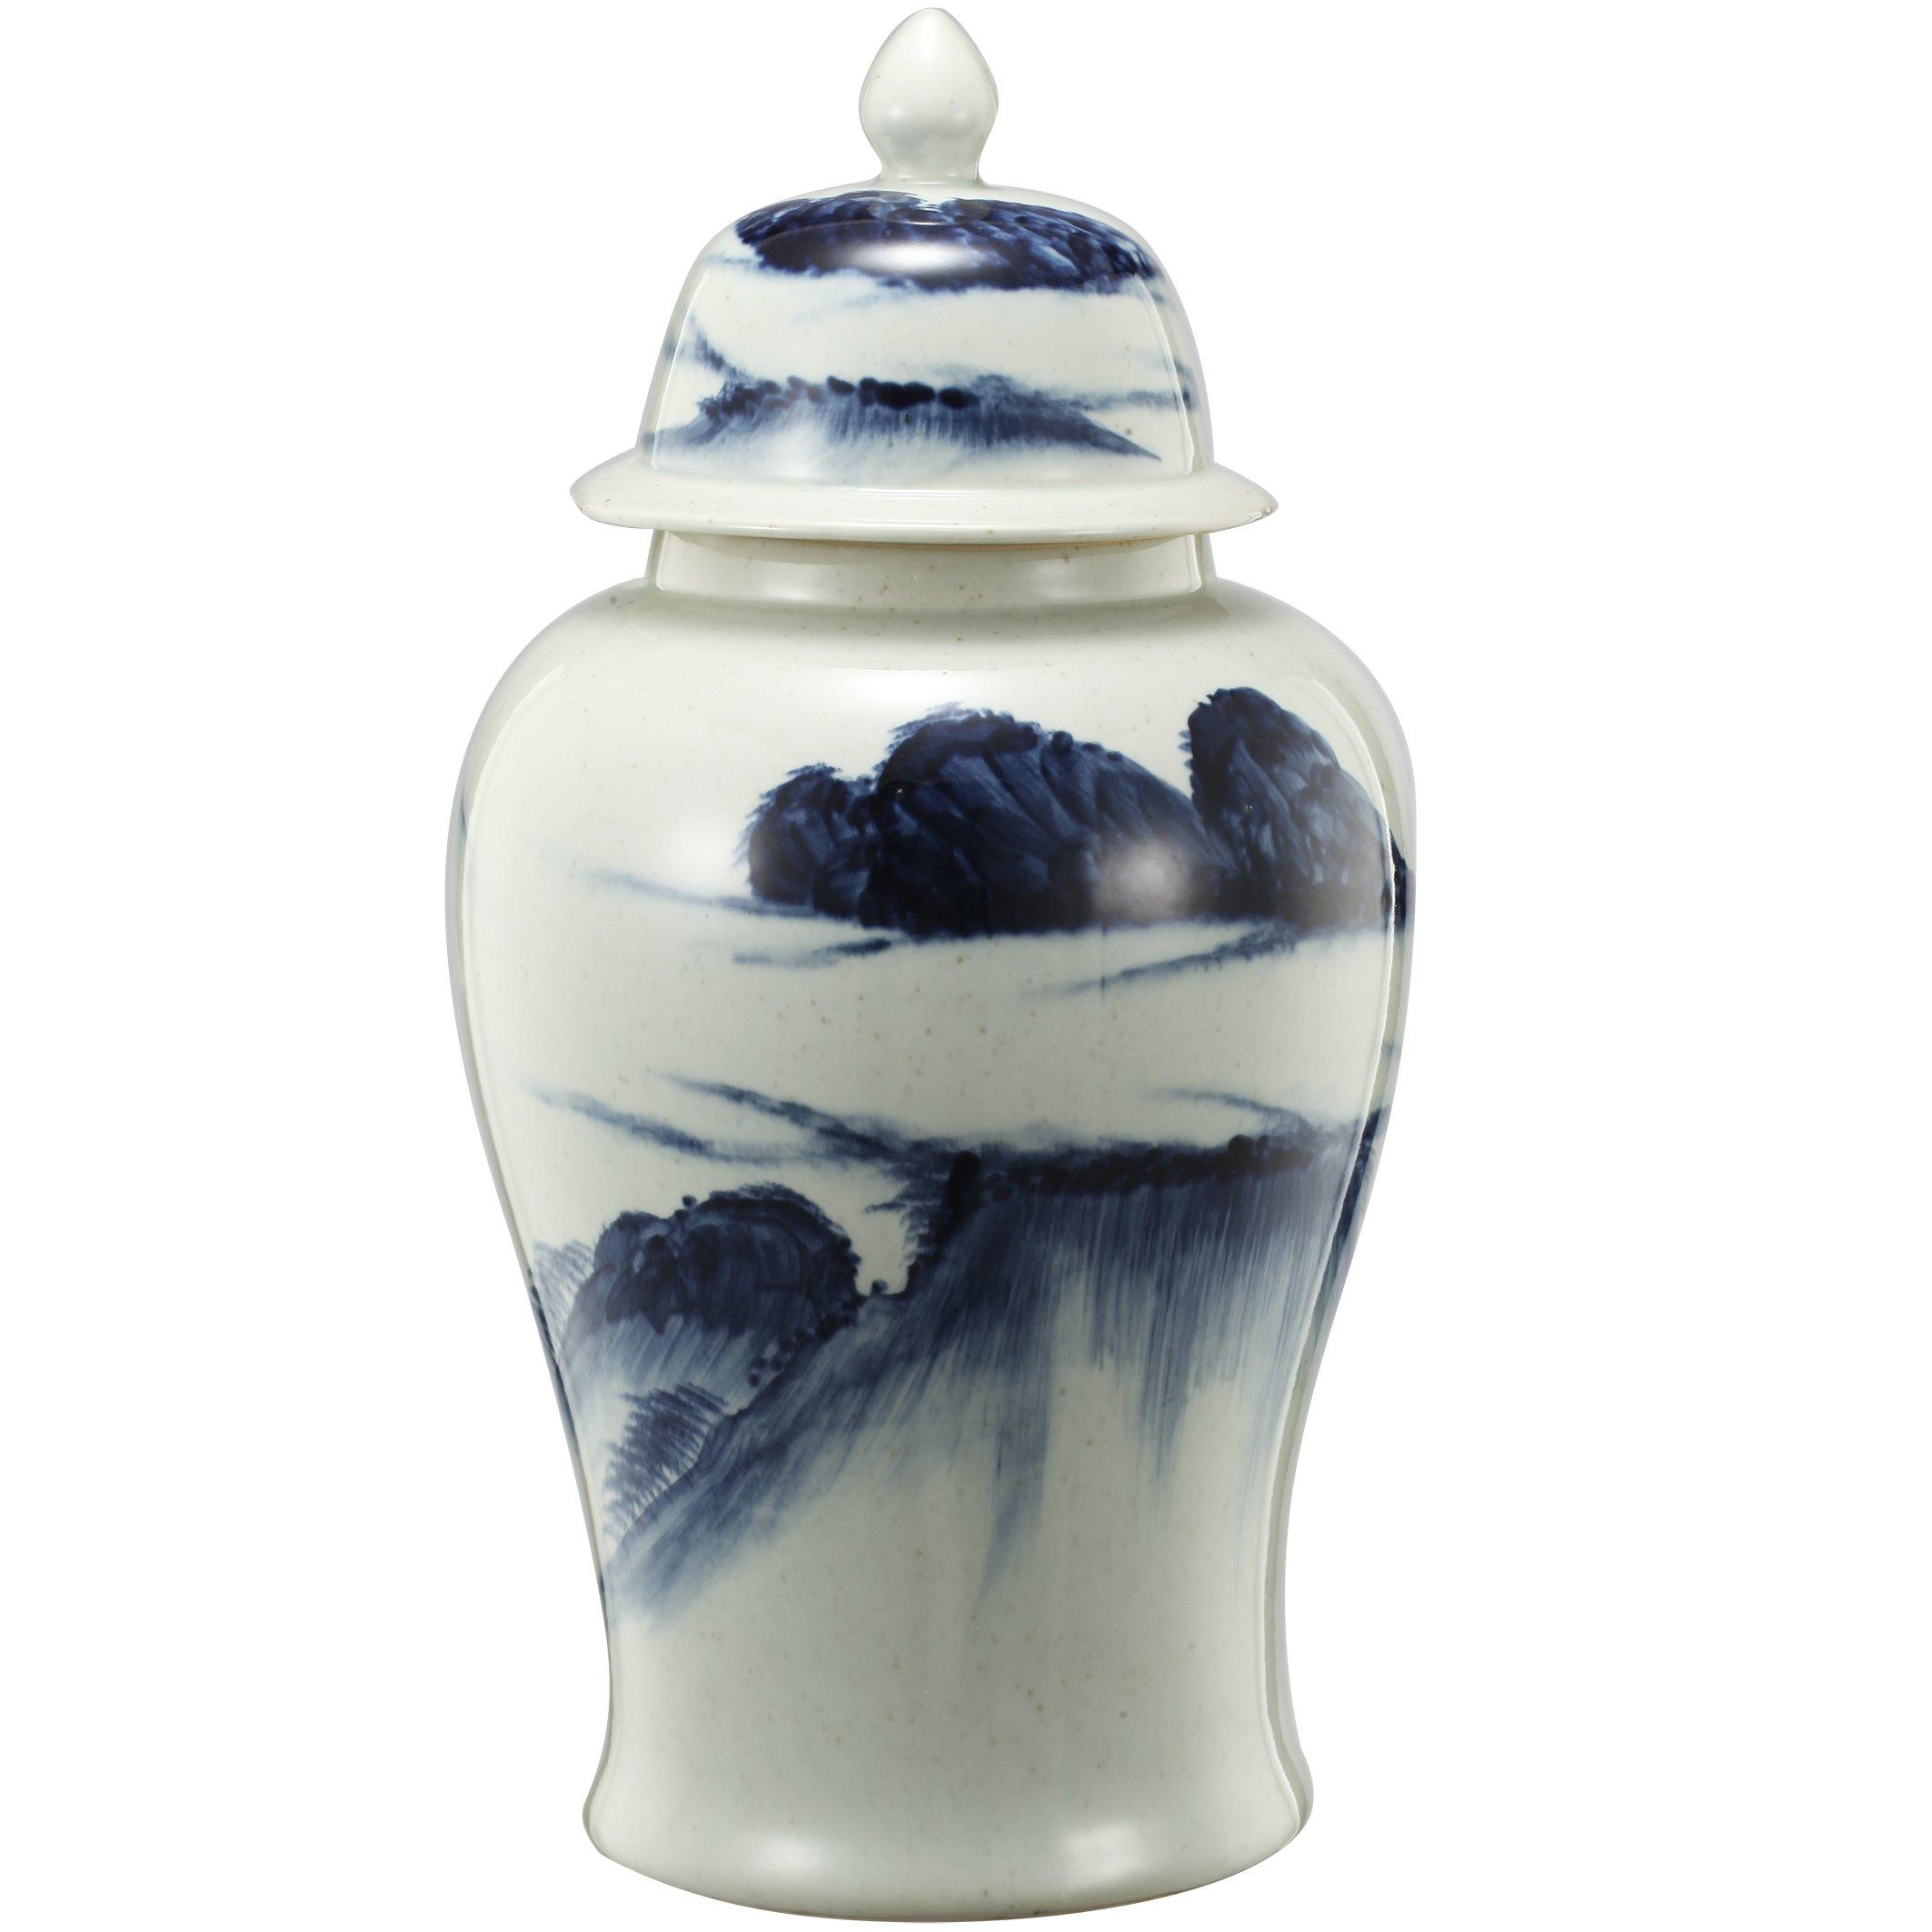 Benjara Benzara BM180954 Ceramic Windswept Ginger Jar, White and Blue,